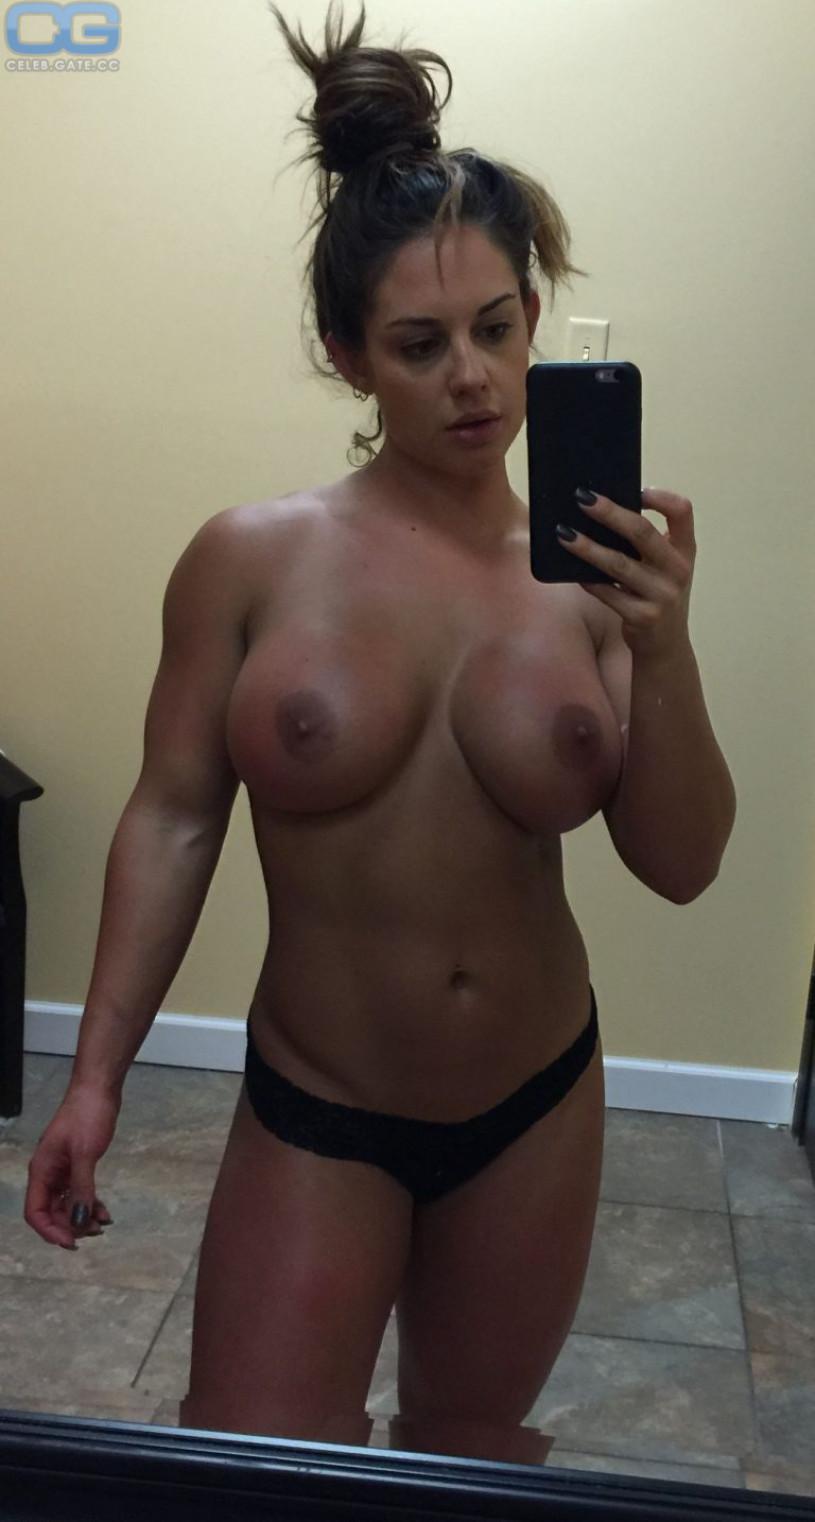 Nudes Celeste Bonin nudes (45 photo), Tits, Fappening, Instagram, in bikini 2020